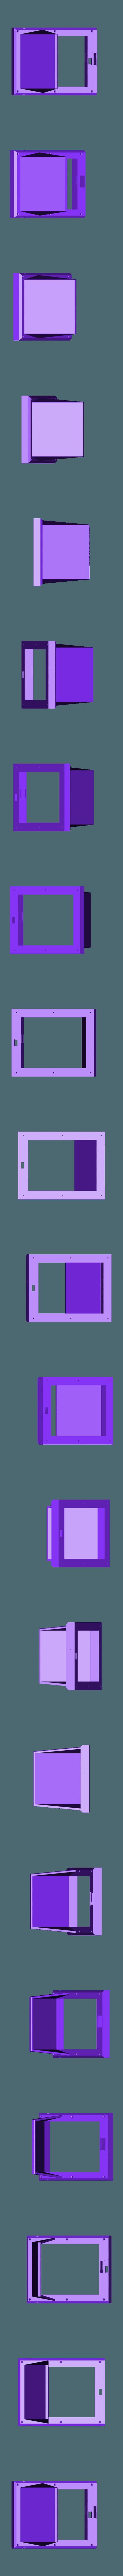 KatzenklappeTeil3a.stl Download free STL file Cat Flap Automatic Door • 3D printing model, Edd77